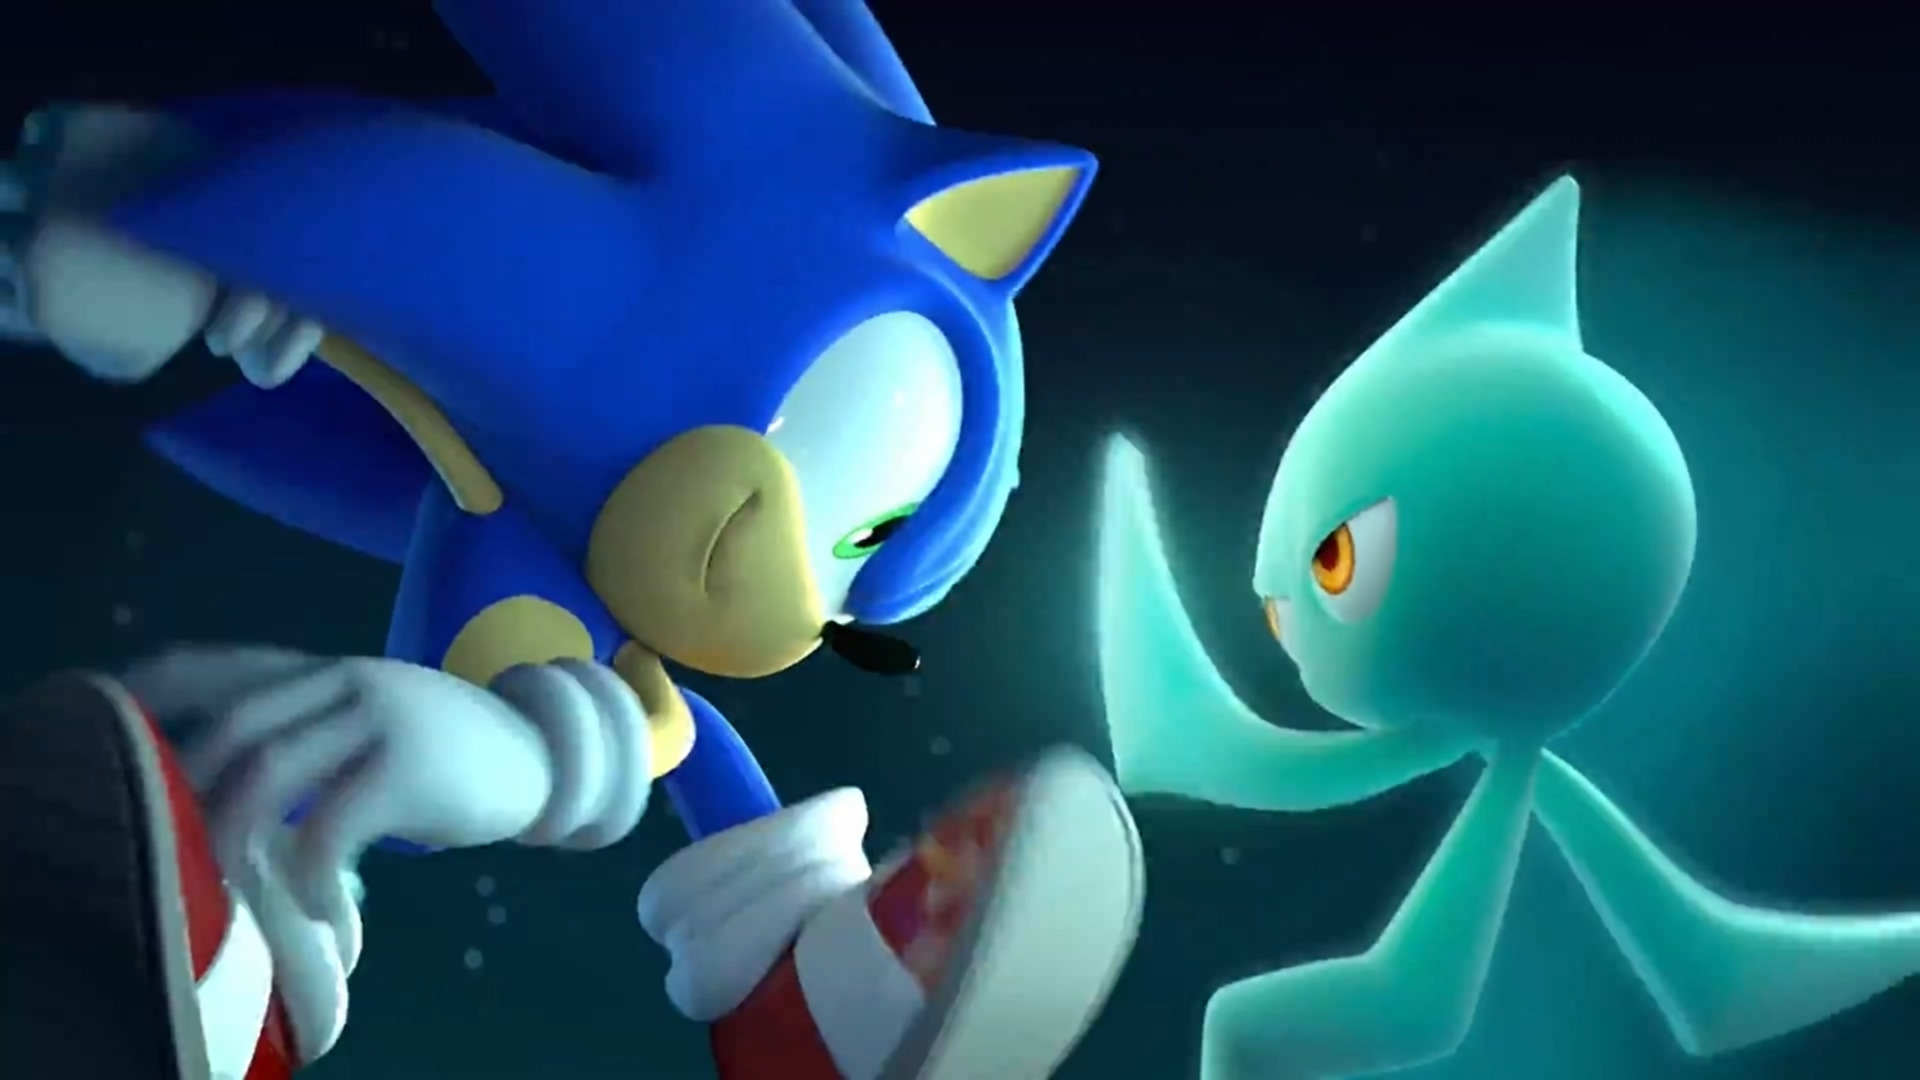 Trailer, SEGA, Jump & Run, Sonic, Igel, Sonic Colours, Sonic Colours: Ultimate, Sonic Colors, Sonic Colors: Ultimate